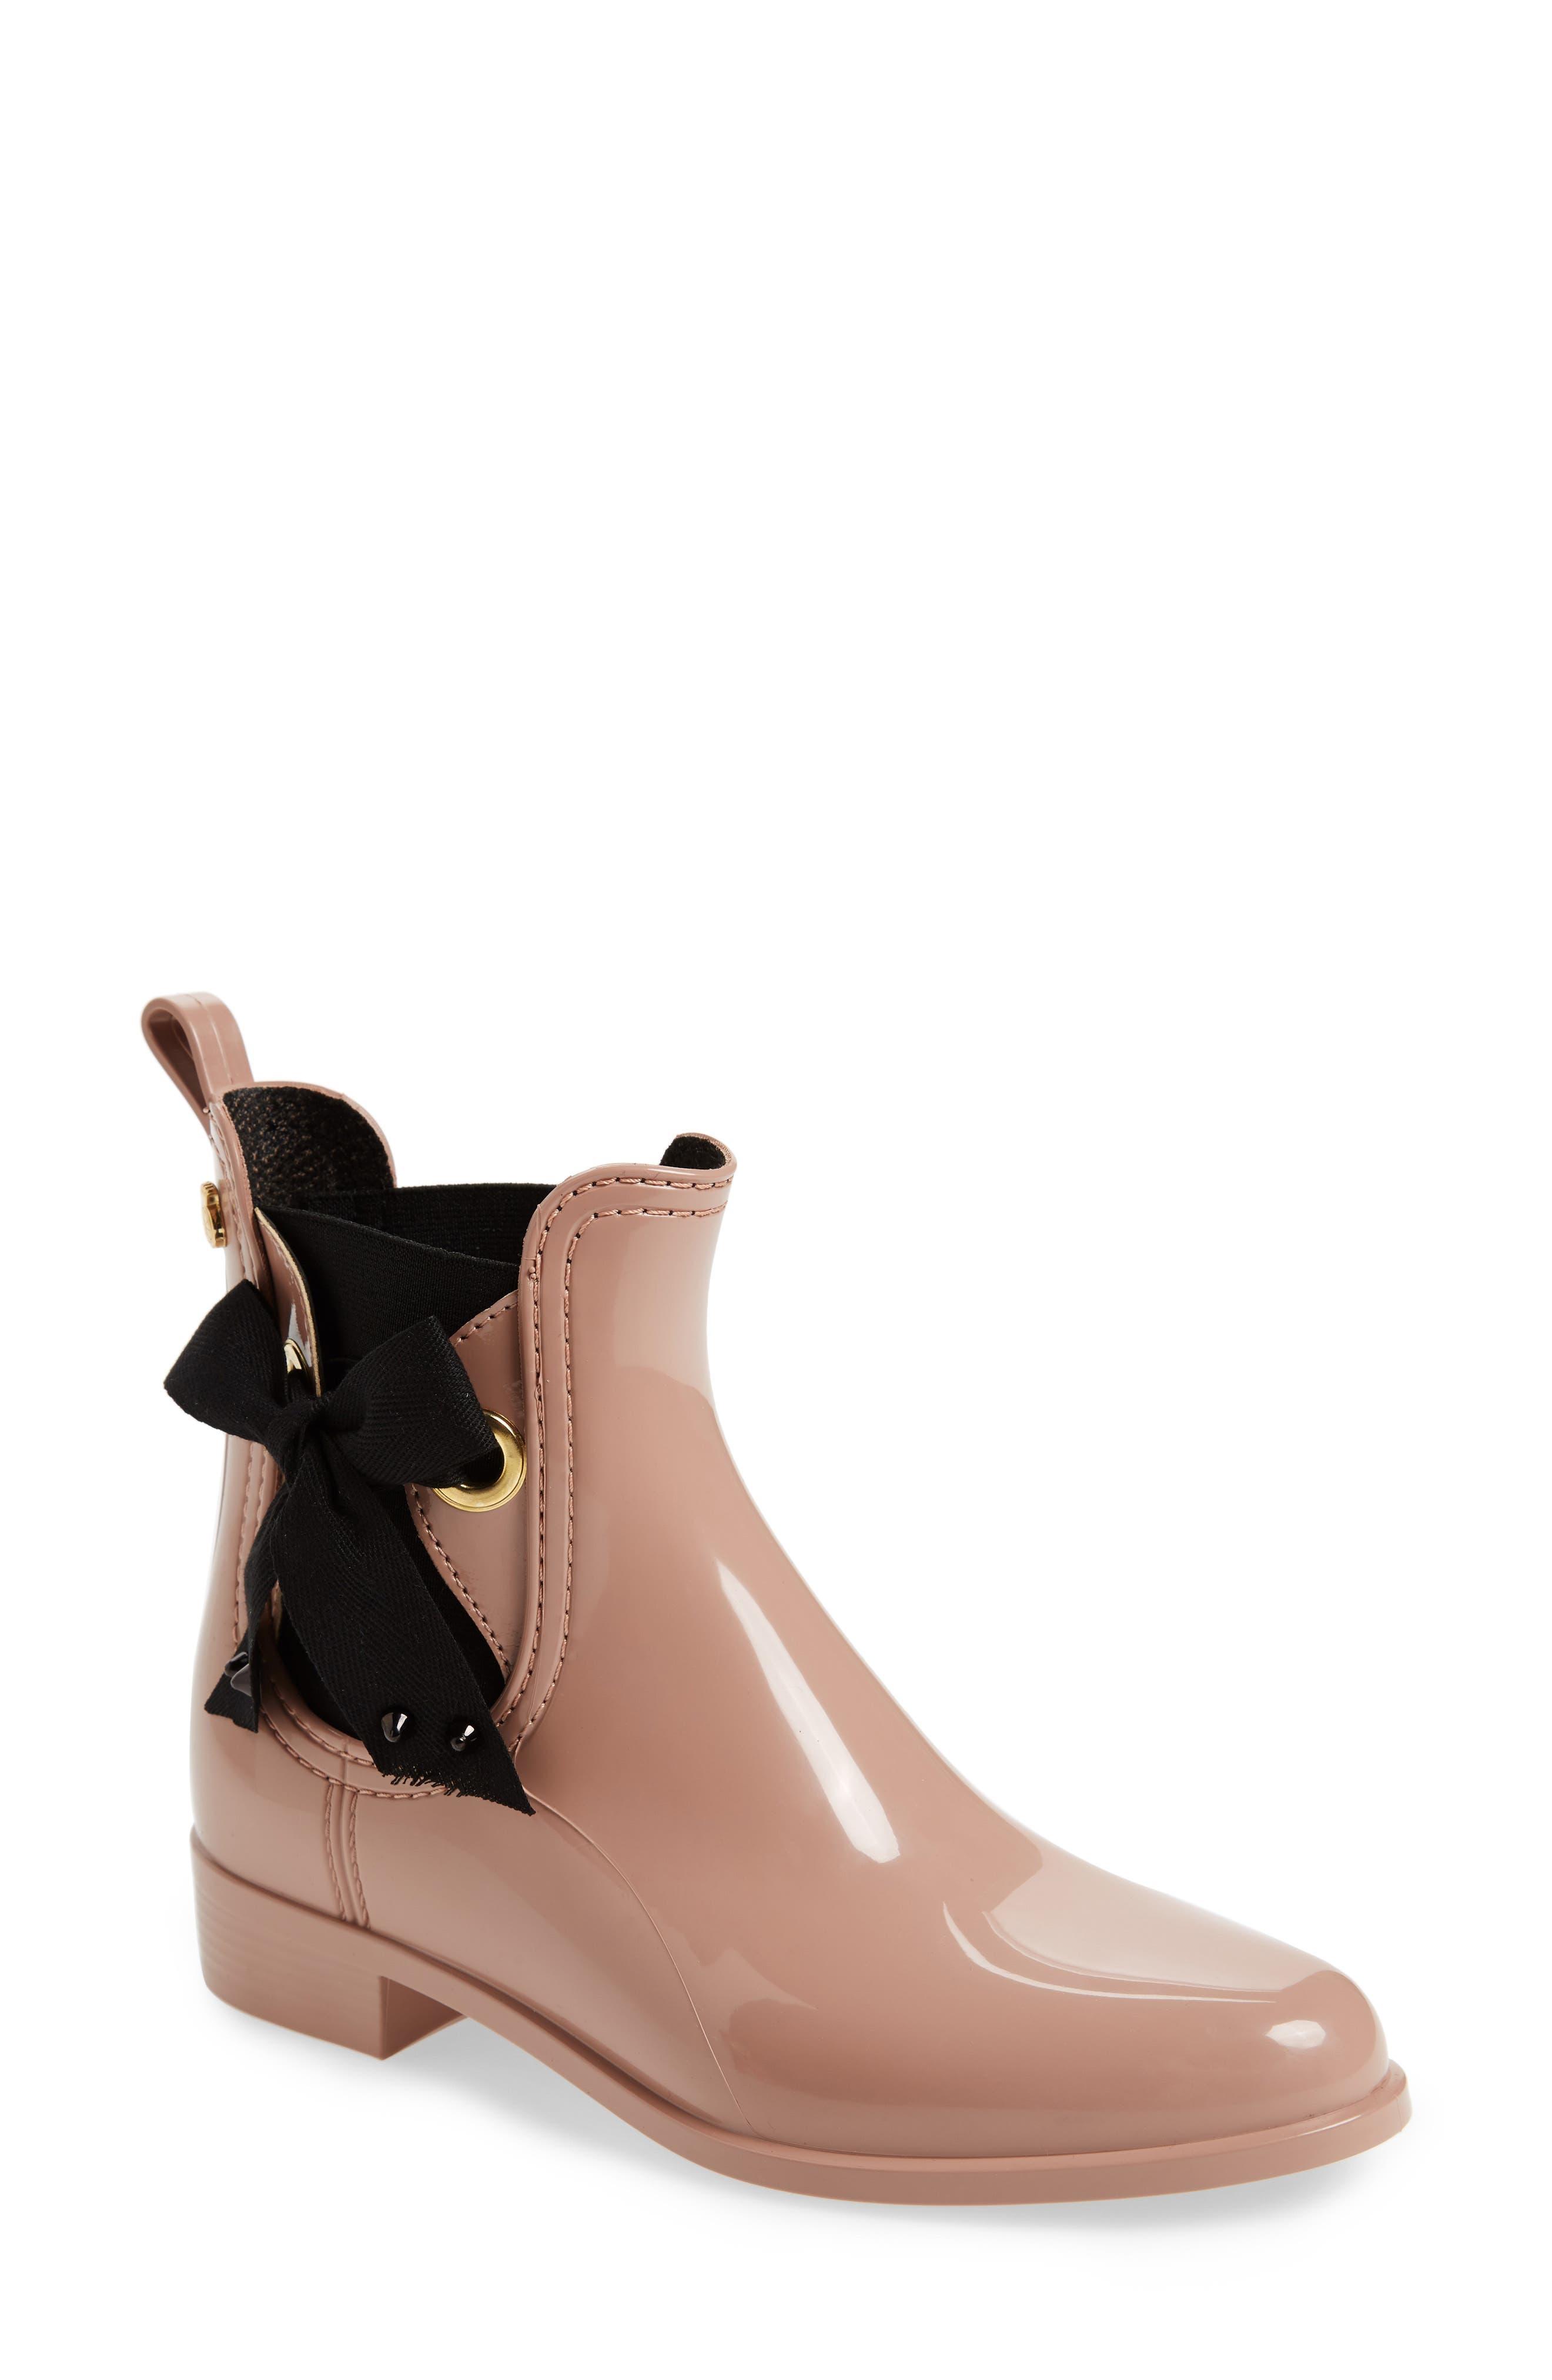 Womens Boots Flight Tracker 84981199 Rag Bone Shearling Cuff Hailey Mules Black 6 5